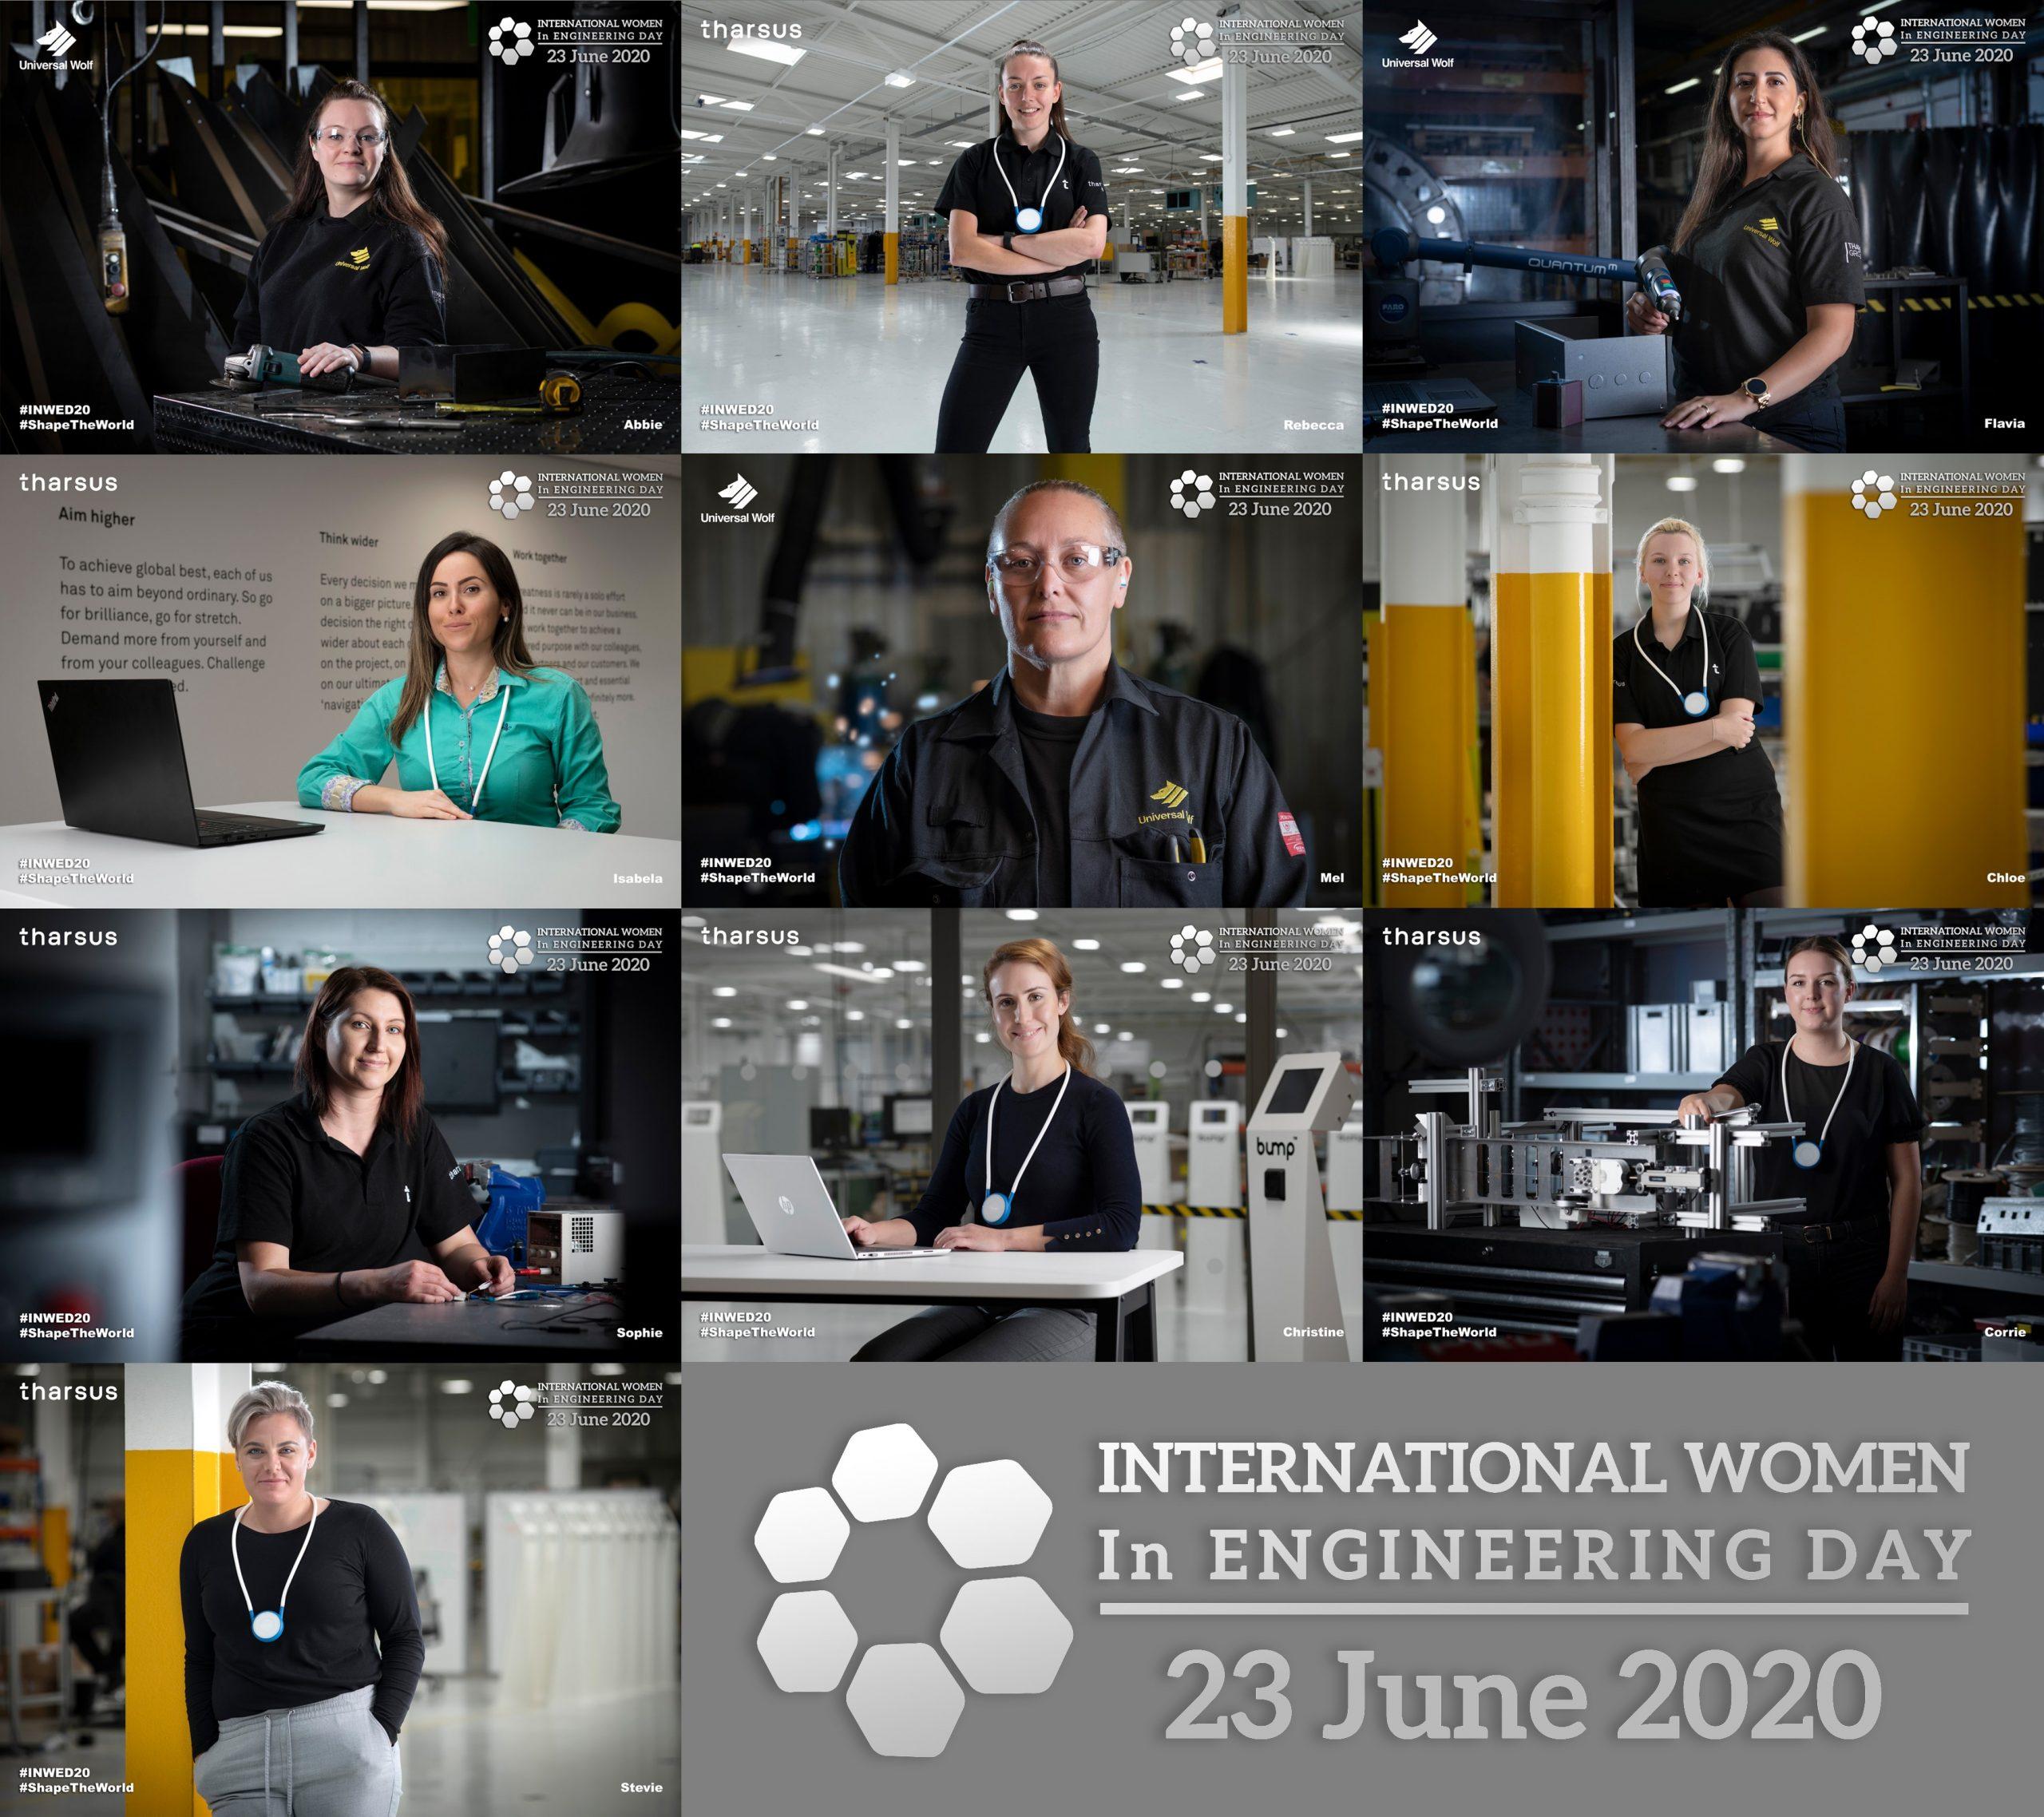 Banner celebrating International Women in Engineering Day 2020